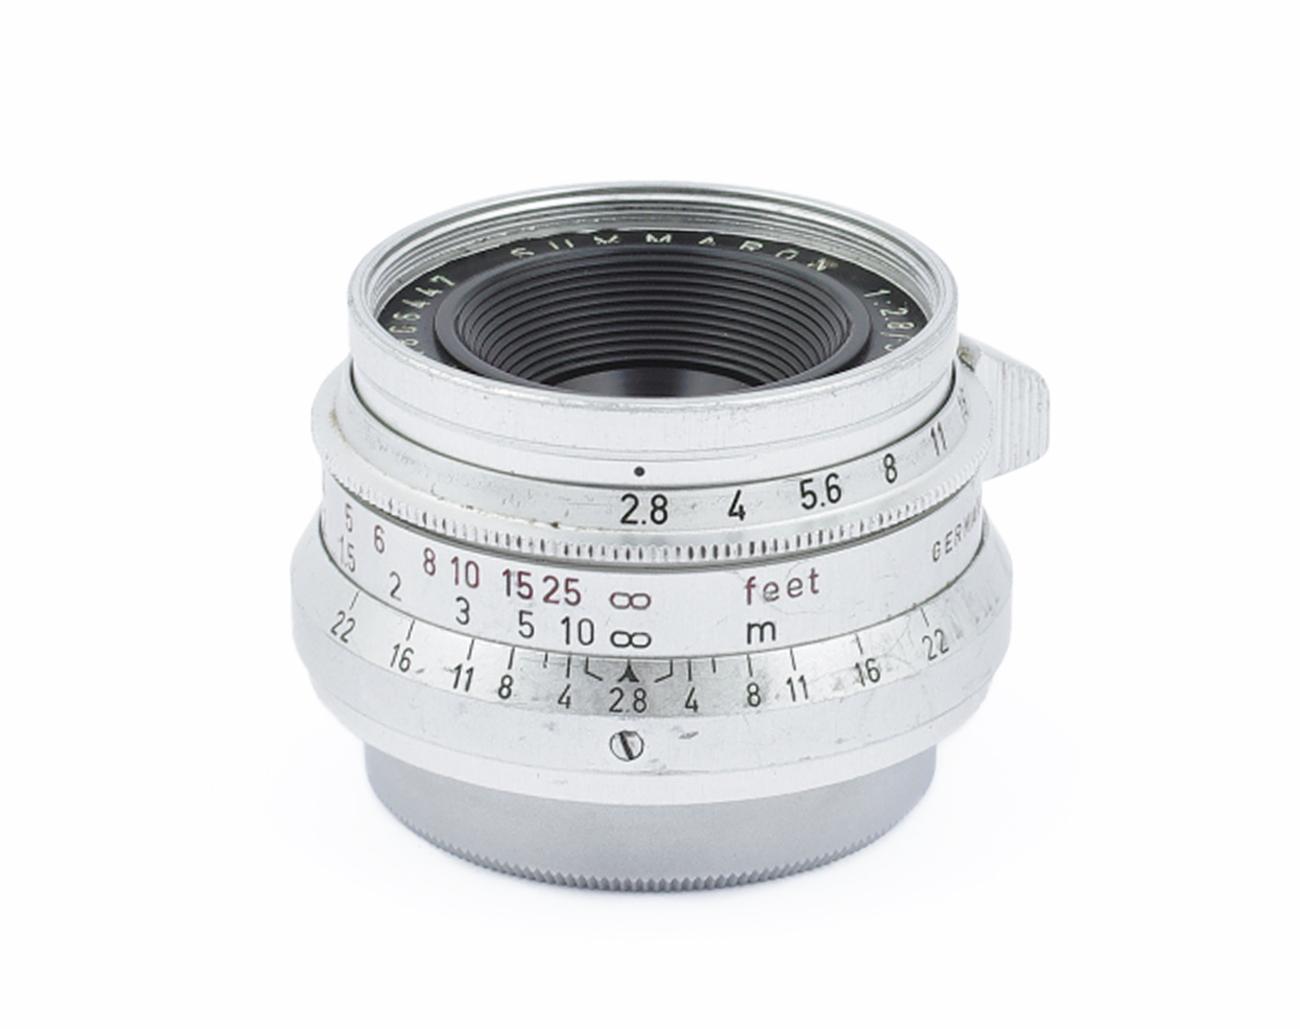 Leica-SM-Summaron-2-8-35-mm-1808447-Germany-LTM-L39-Lens